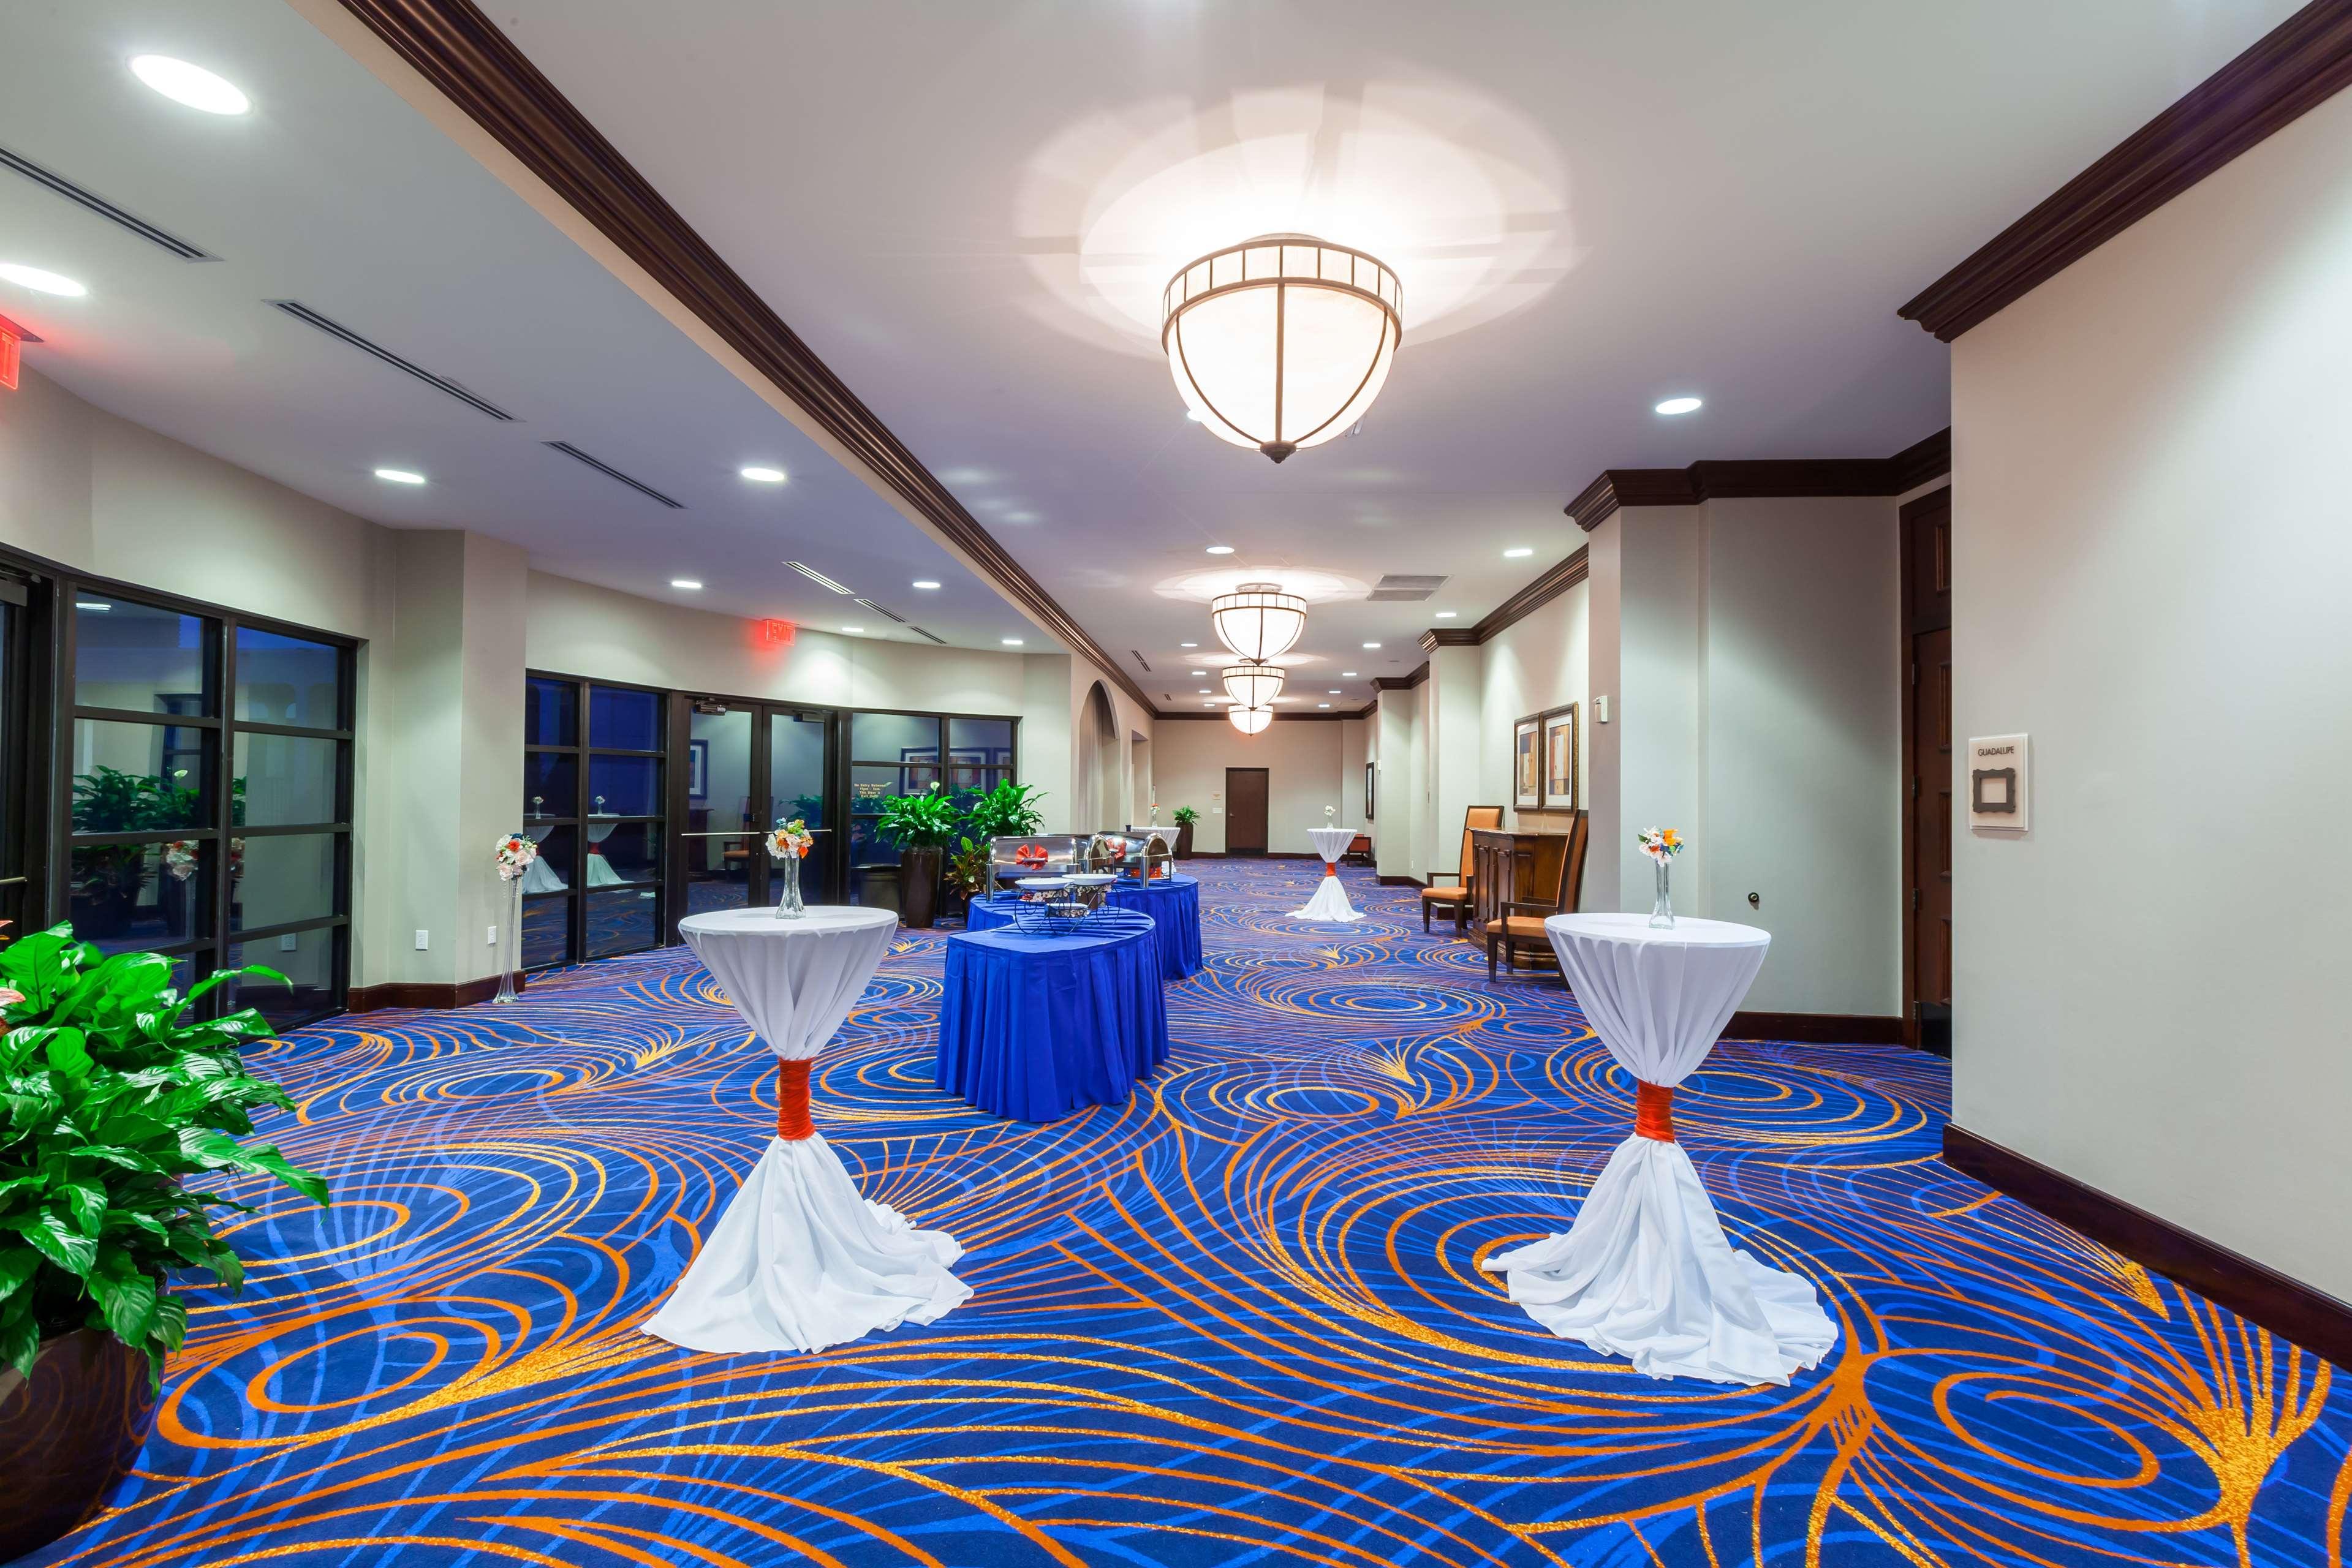 Hilton Waco image 61